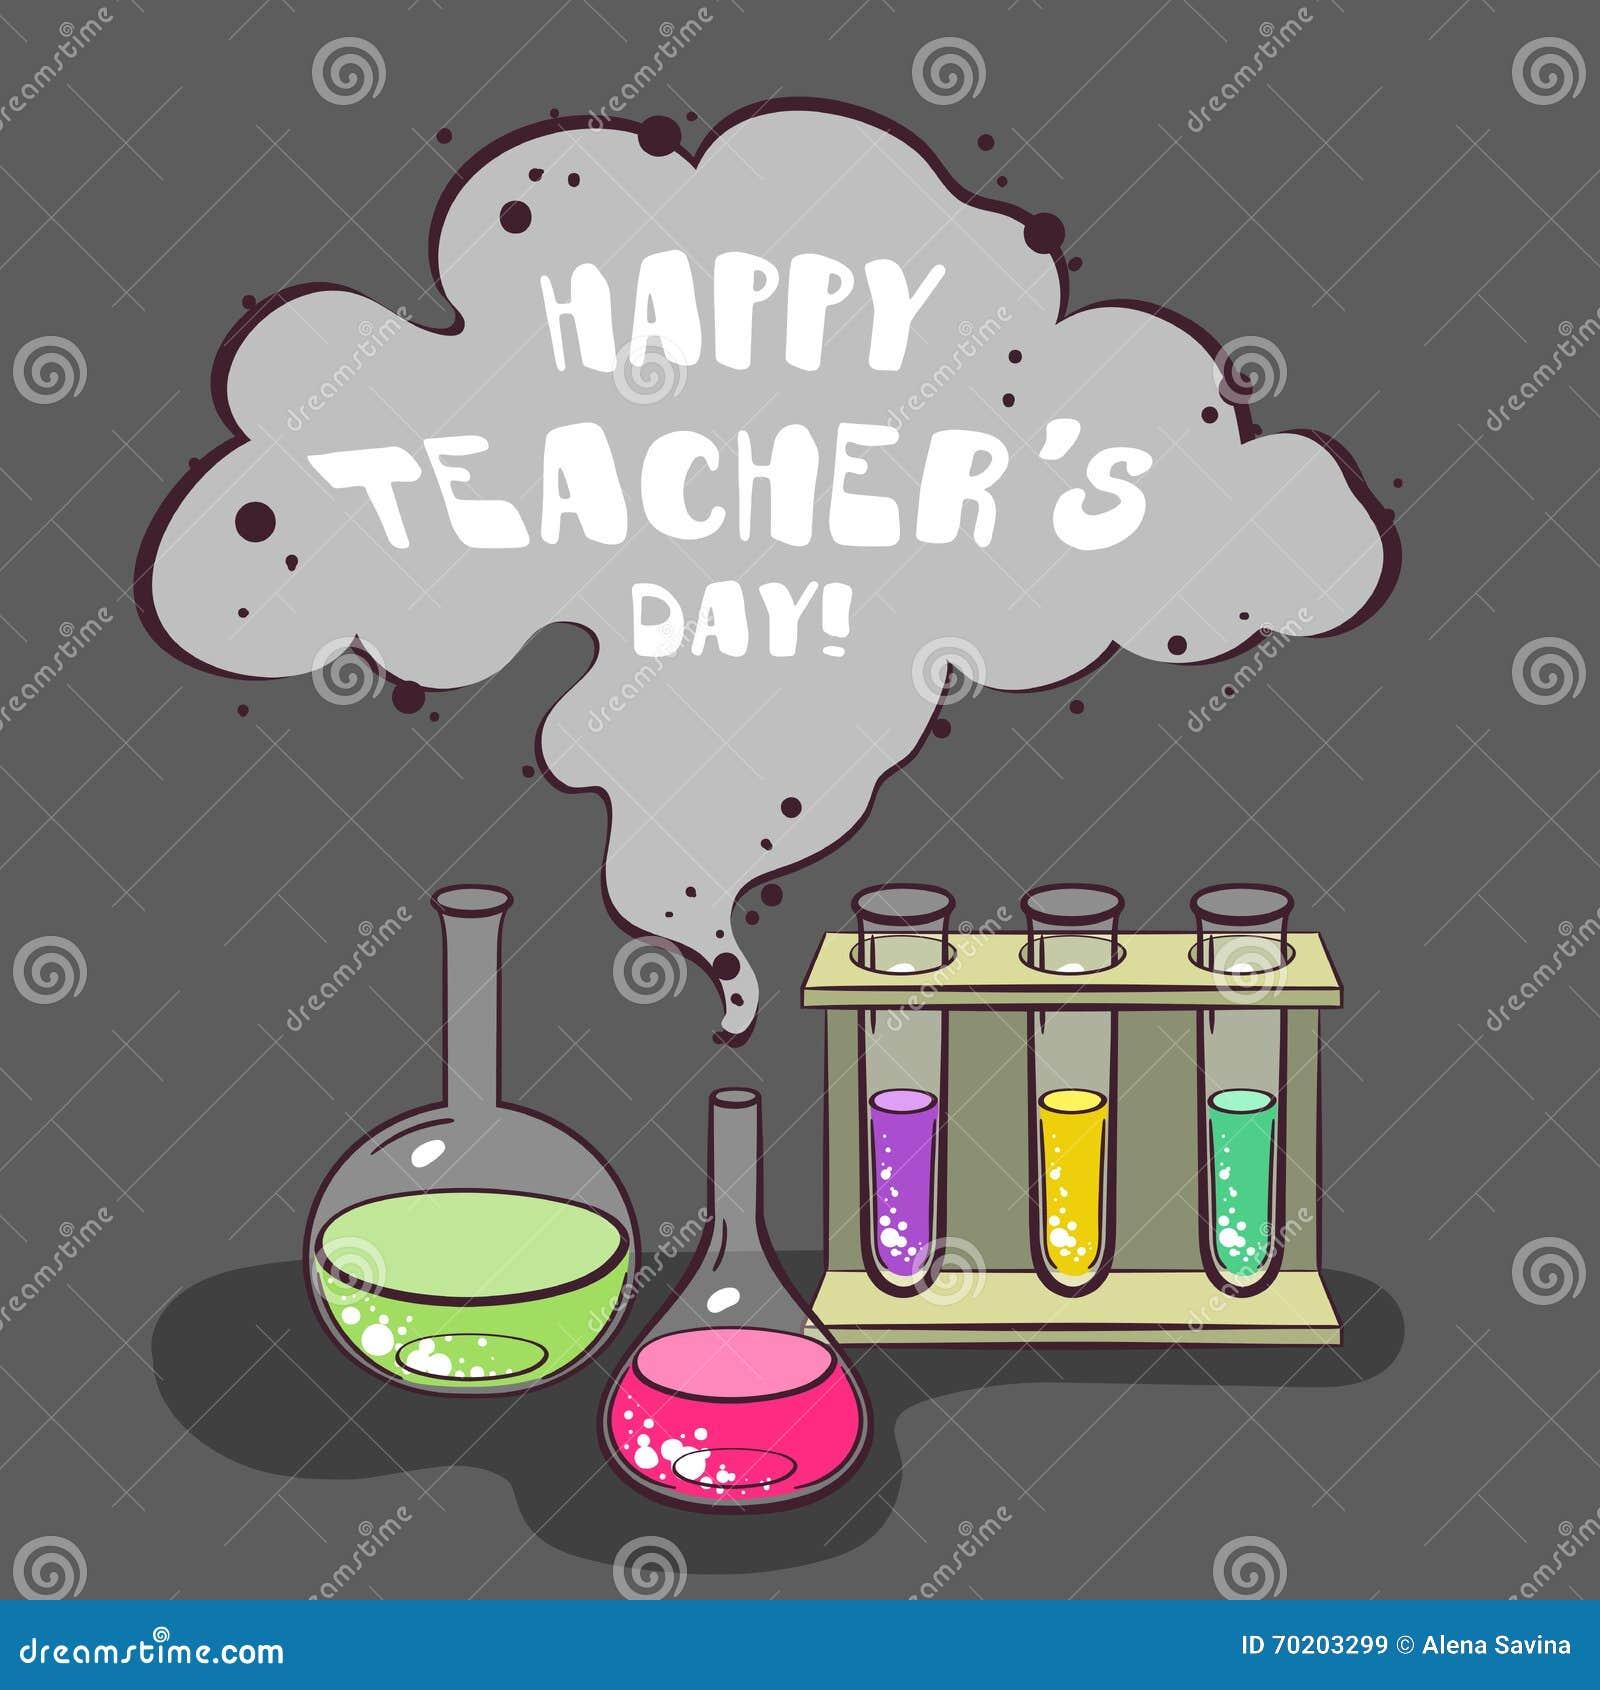 Happy Teachers Day Chemistry Stock Vector Illustration Of Design